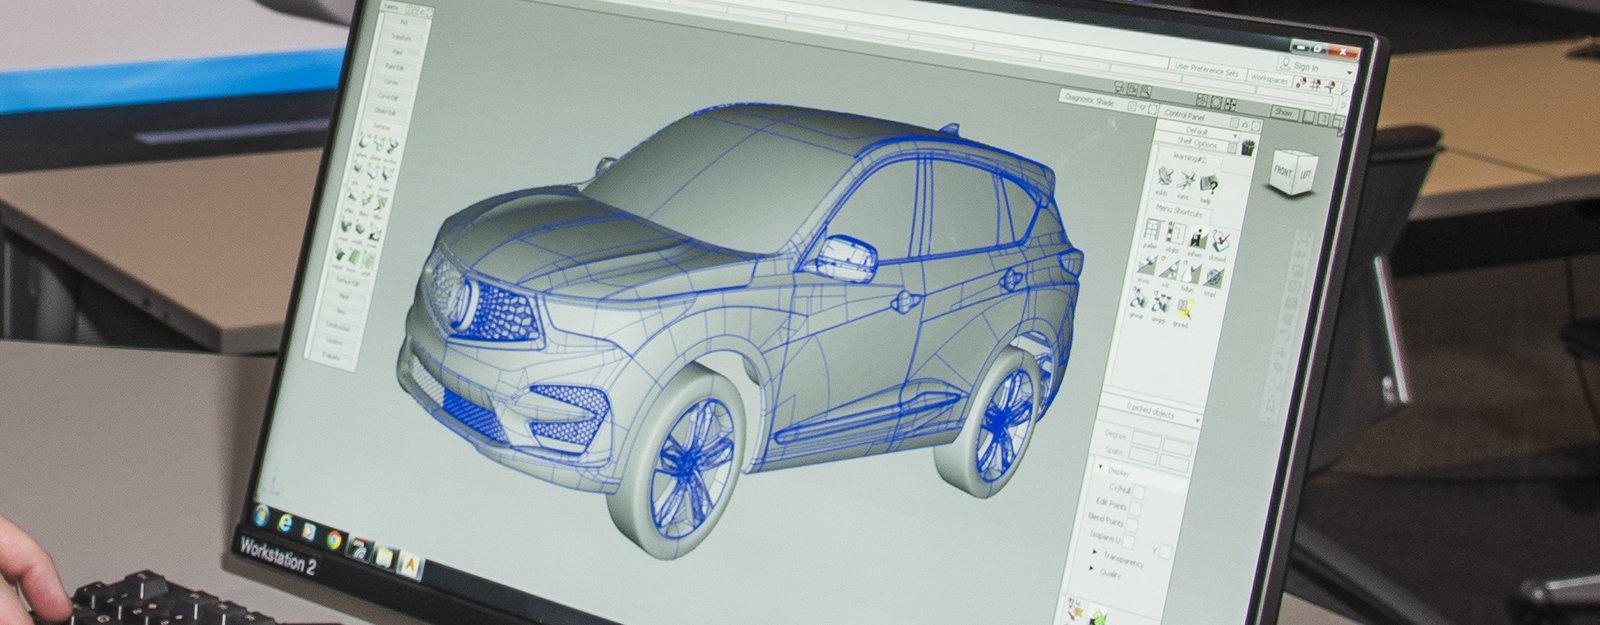 A Look At Six Car Design Specialties Part 3 The Digital Modeler Core77